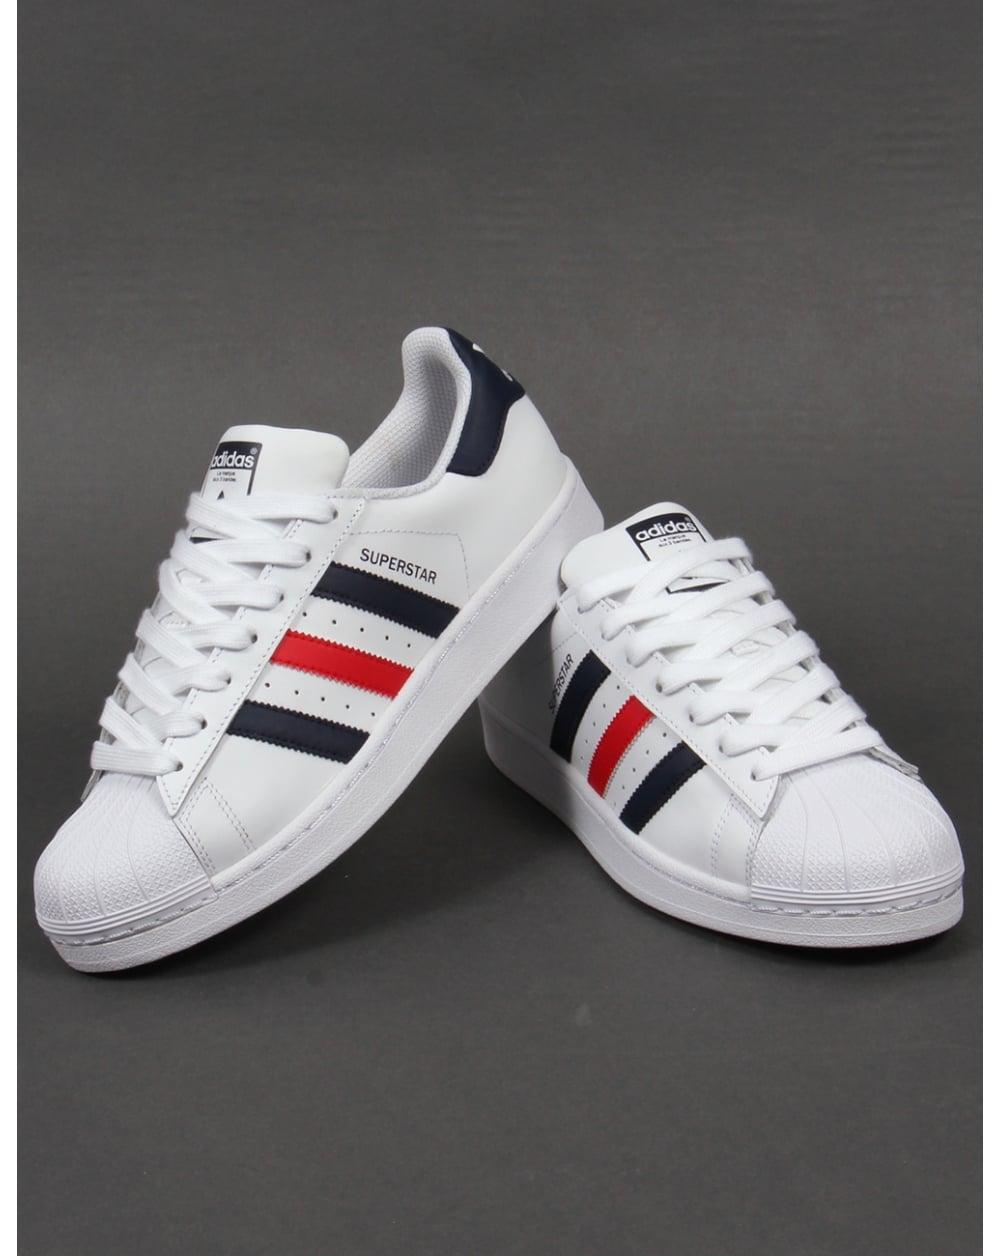 Adidas Superstar Foundation White Black herbusinessuk.co.uk